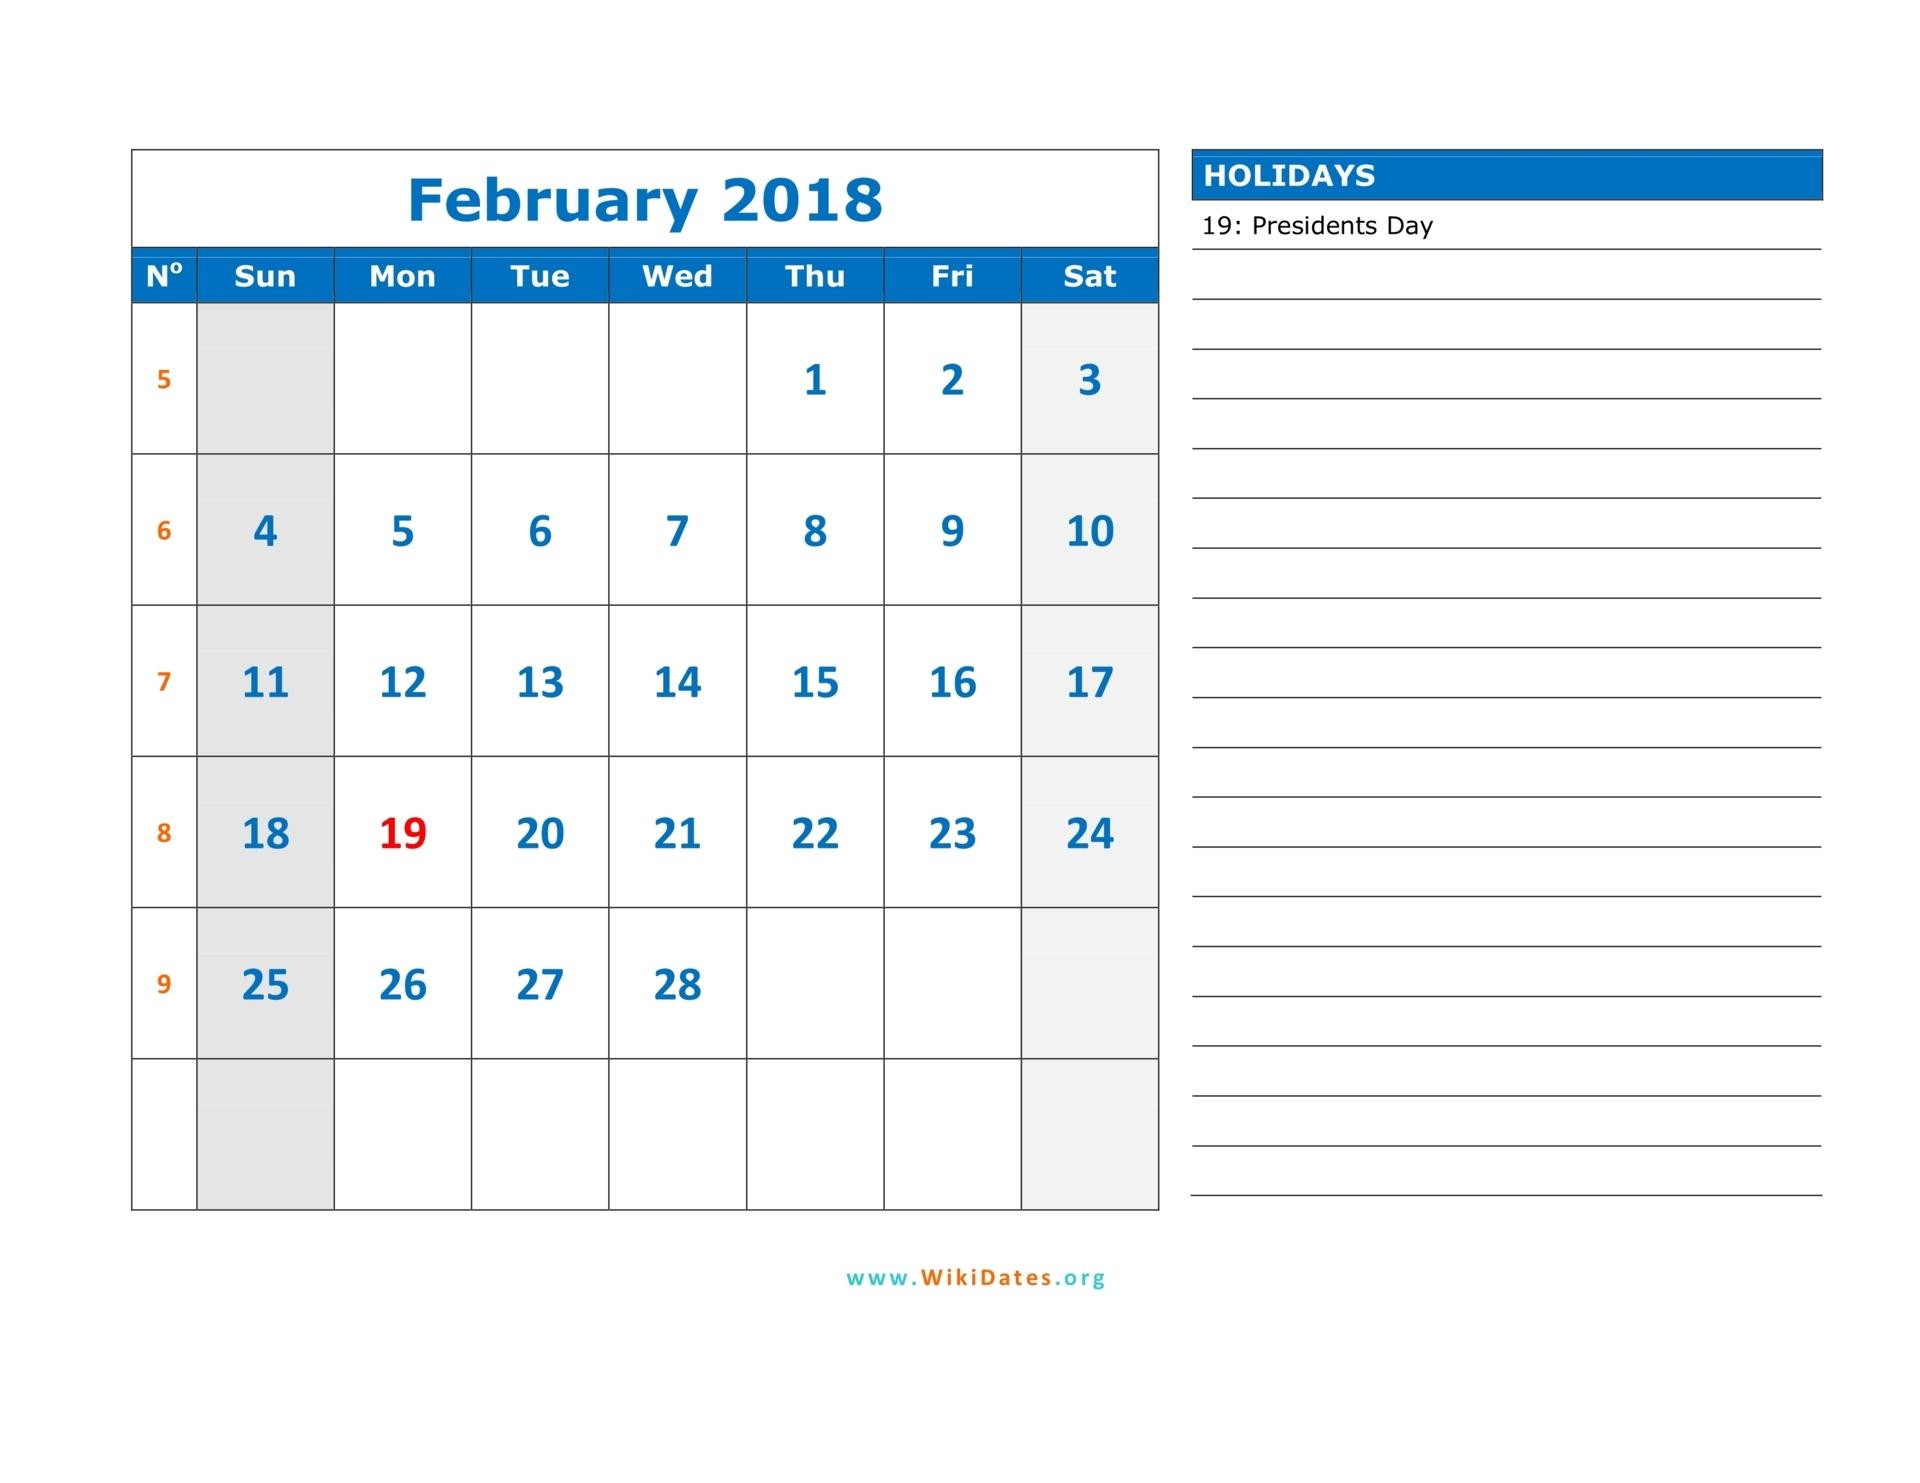 February 2018 Calendar | WikiDates.org